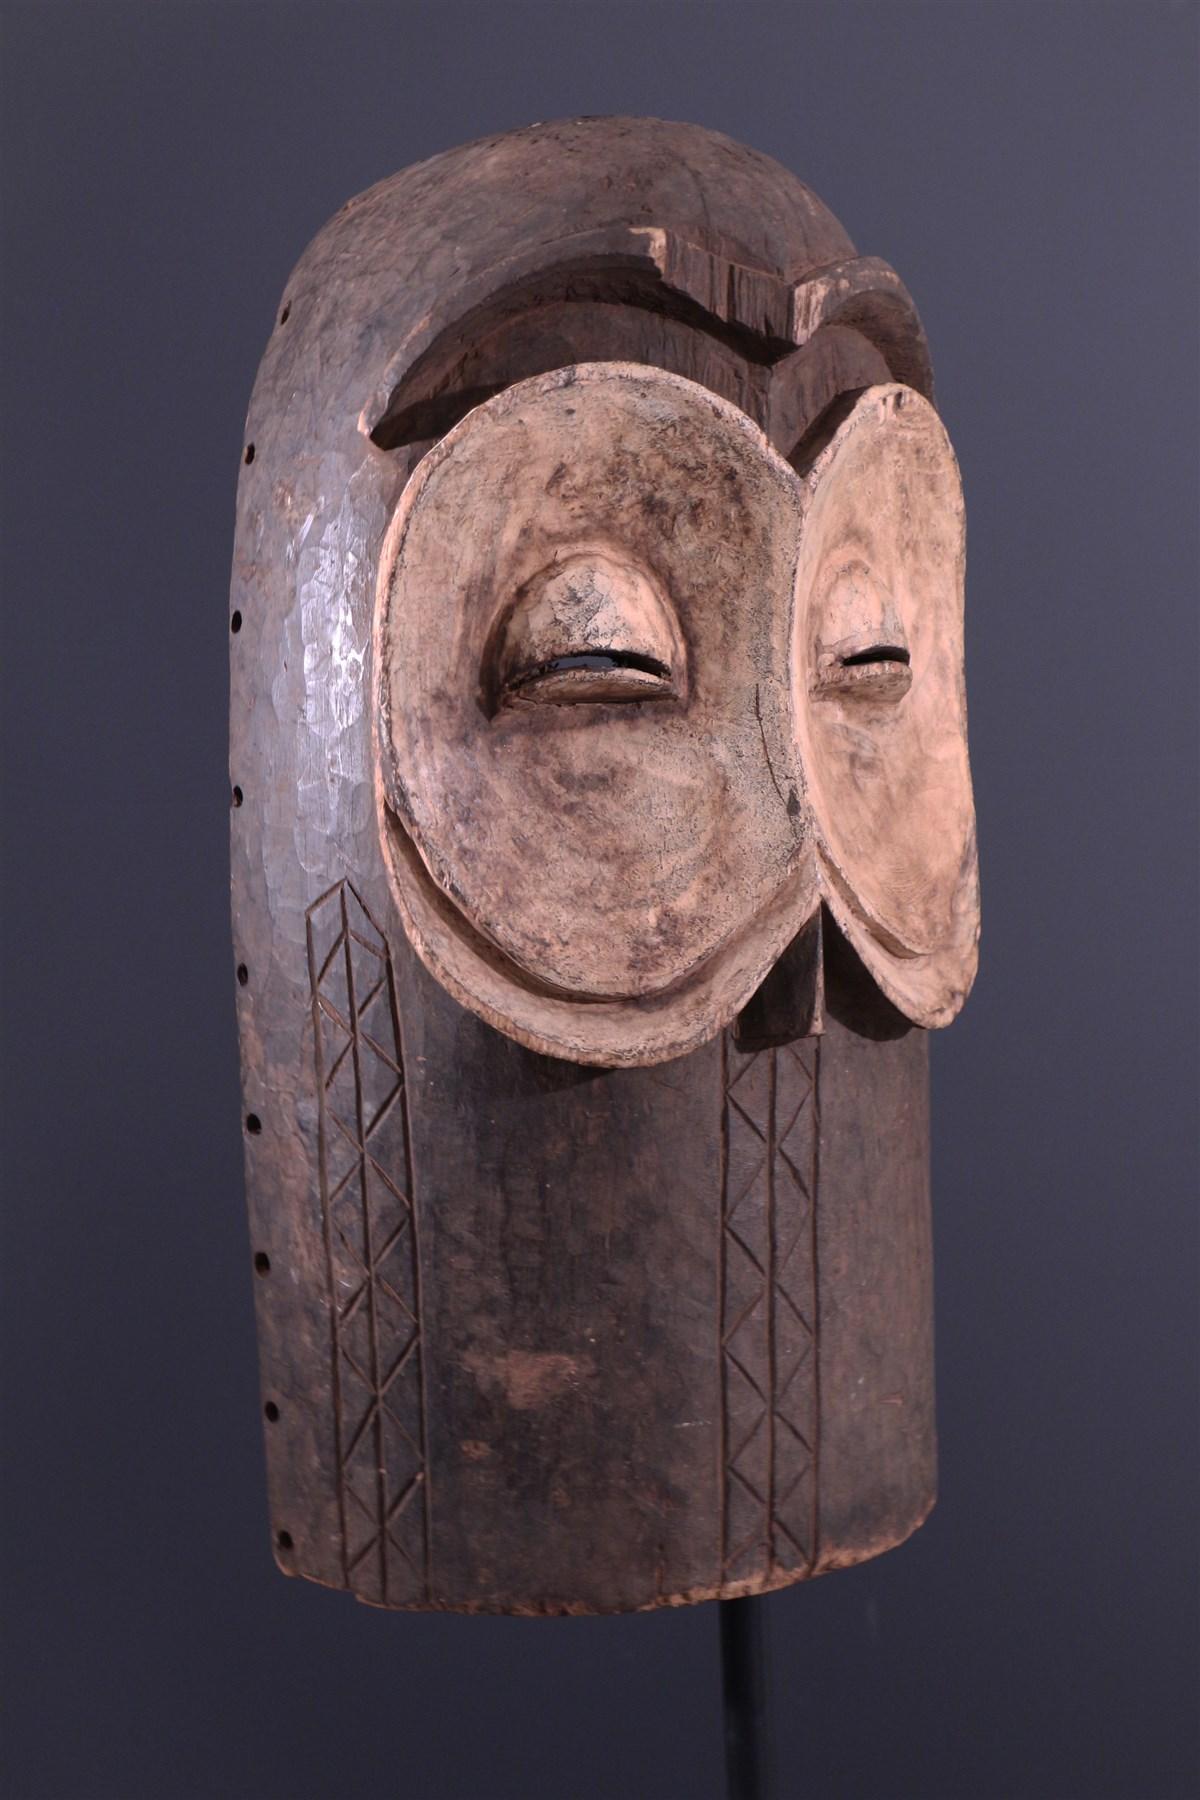 masque bembe 7815 masque africain art africain. Black Bedroom Furniture Sets. Home Design Ideas